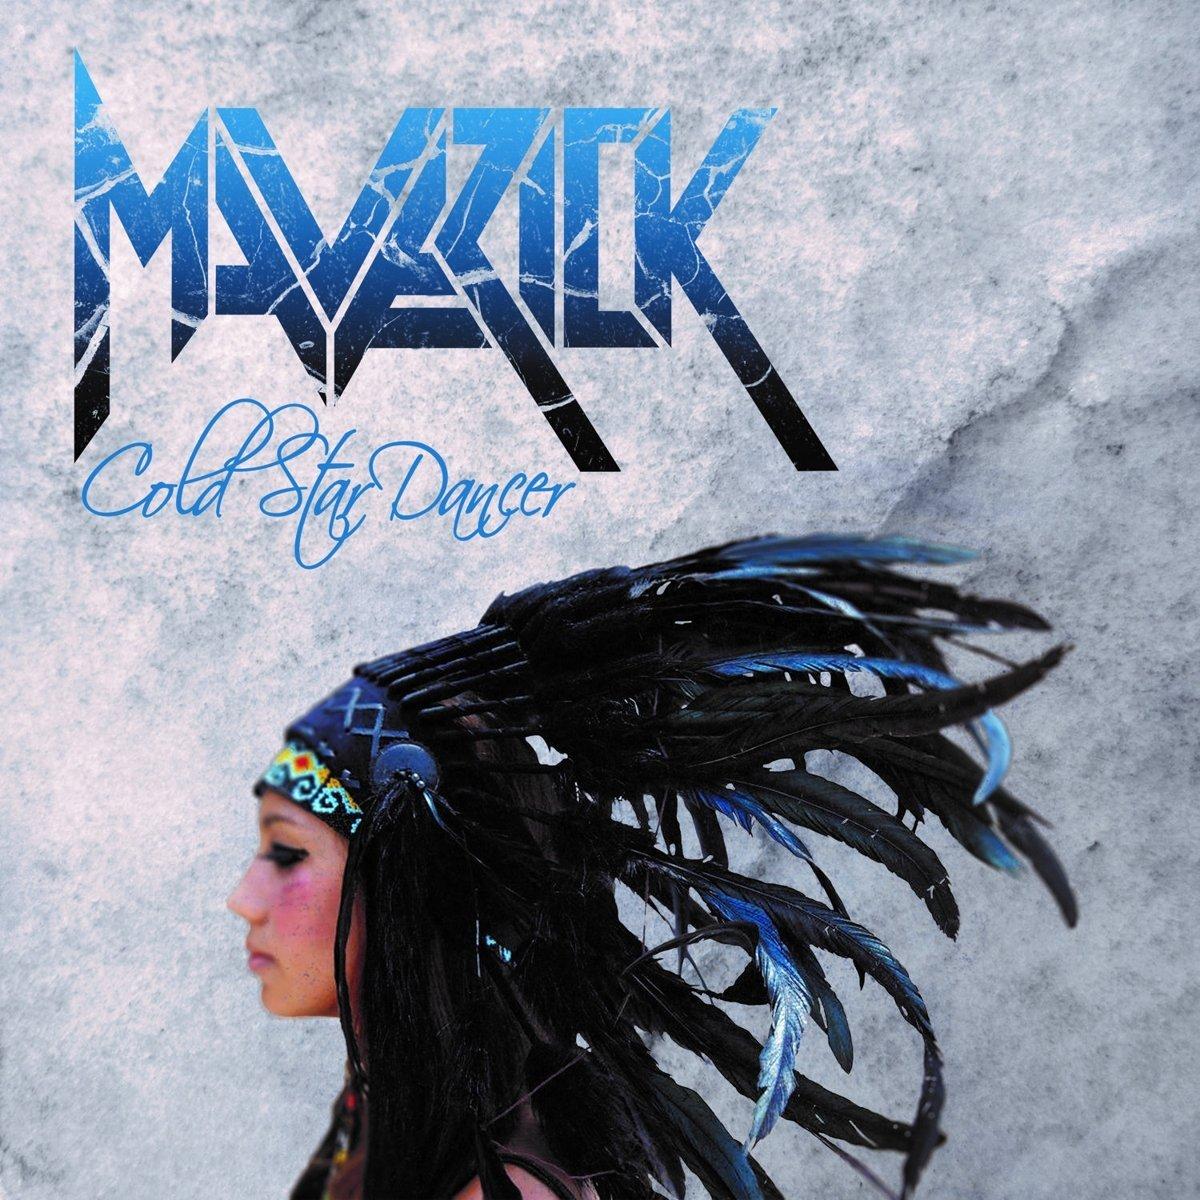 MAVERICK(from Northern Ireland) / COLD STAR DANCER<DIGI>